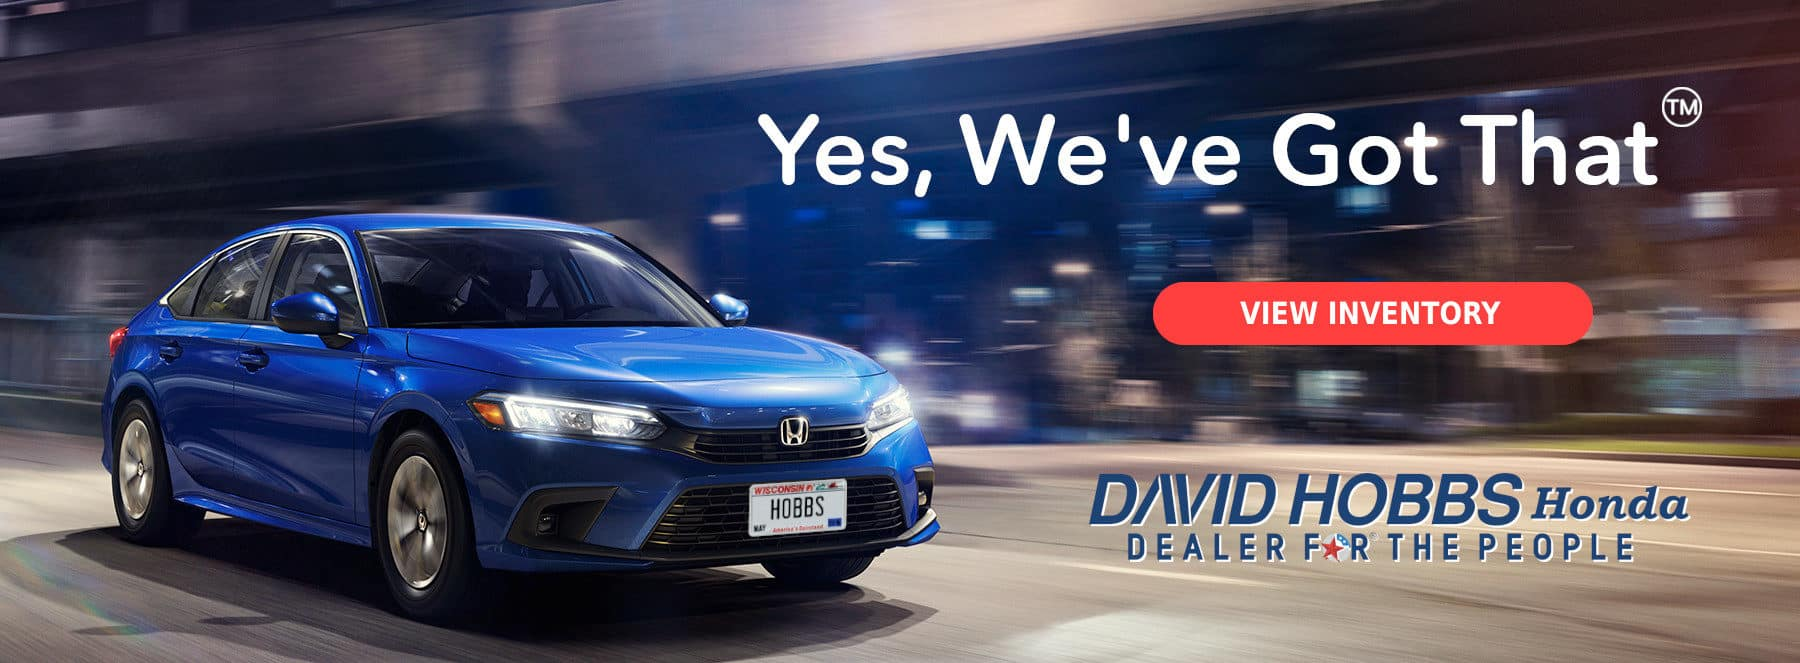 View New Honda Inventory